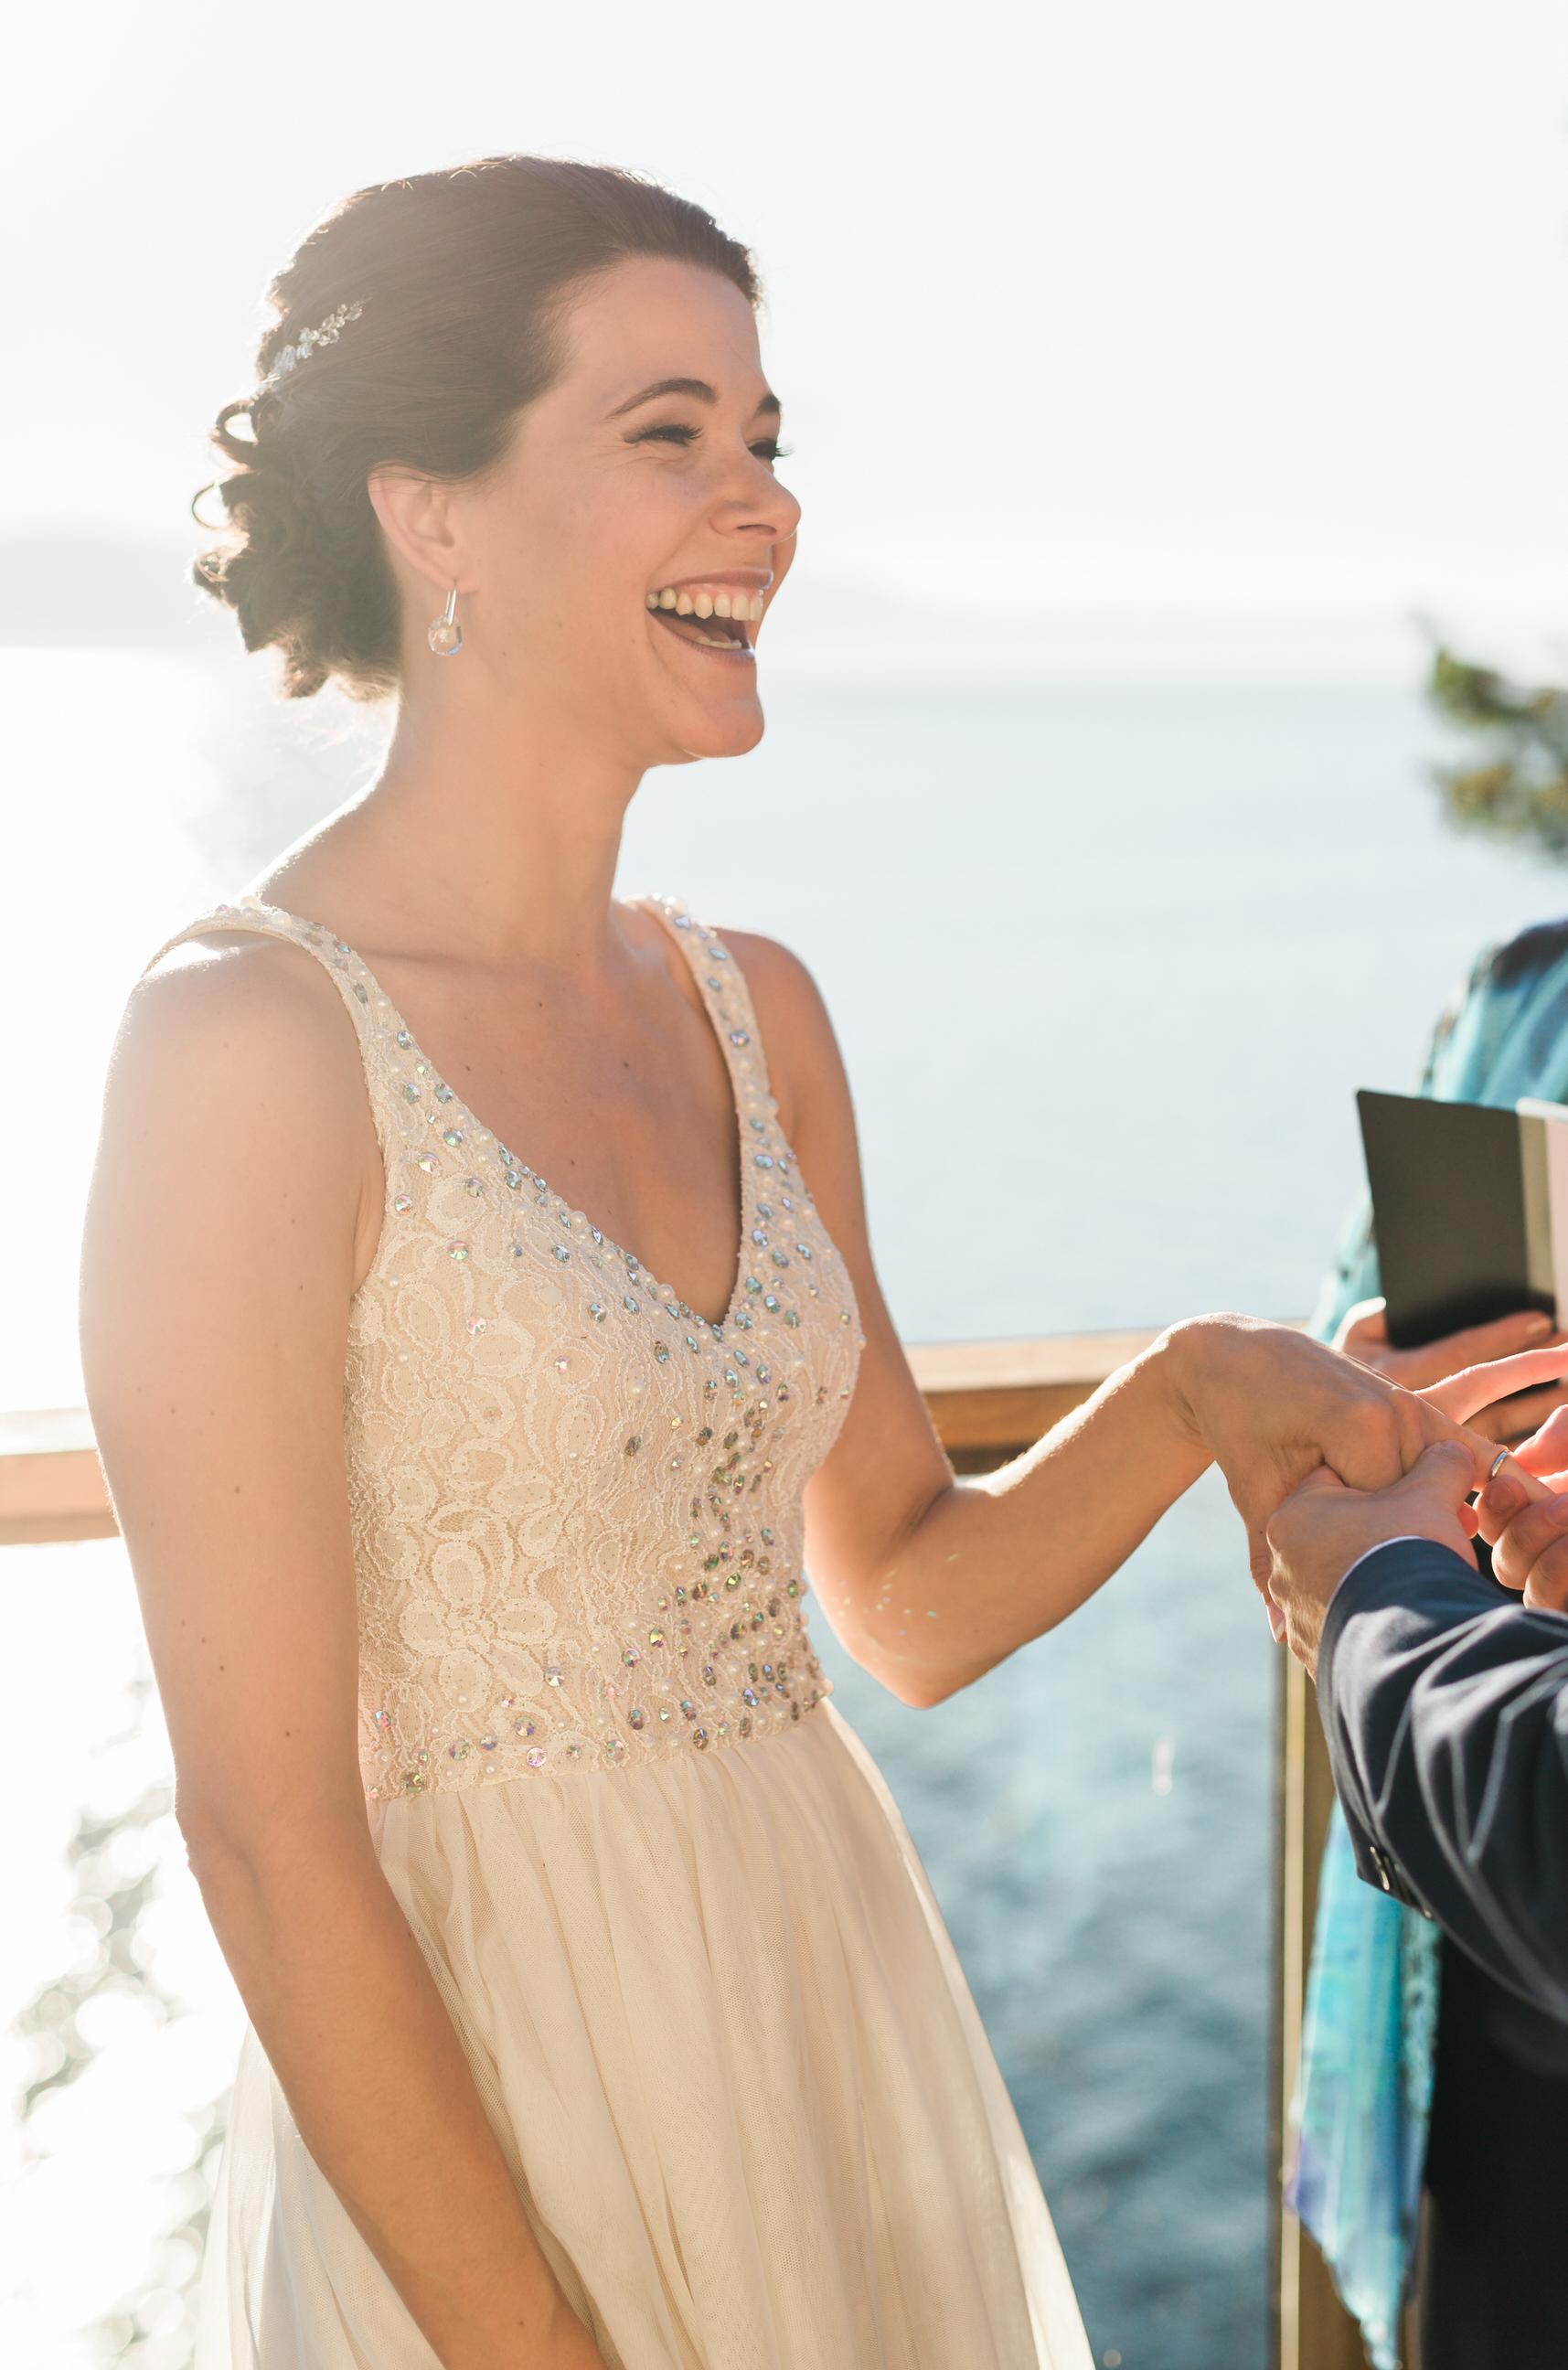 Rockwater Secret Cove Resort Wedding - Sunshine Coast BC Wedding Photographer - Vancouver Wedding Photographer - Sunshine Coast Elopement Photos - IMG_0466.jpg